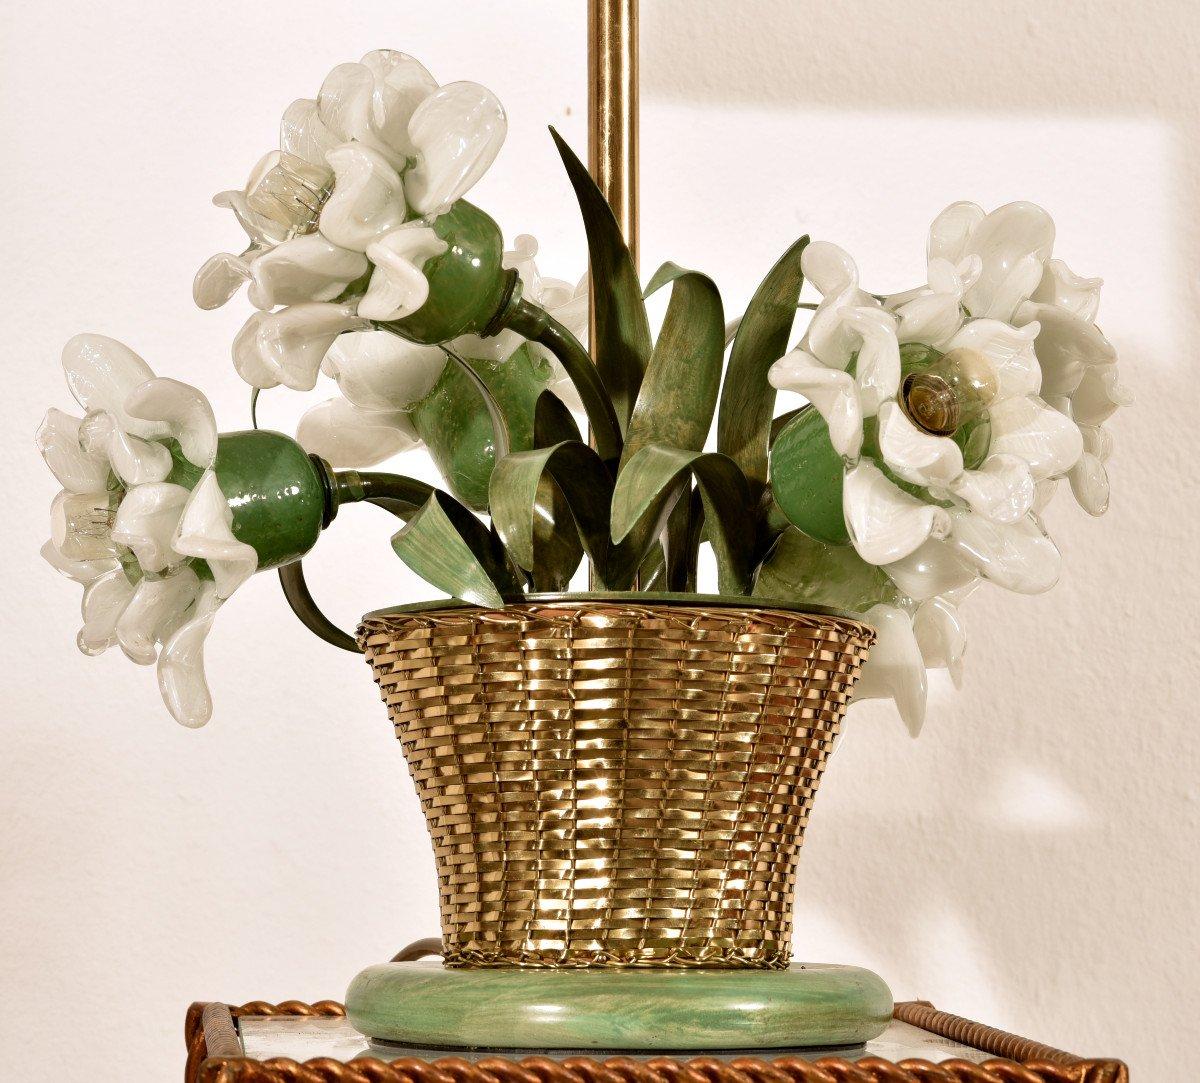 Lampe Corbeille De Roses. Murano. Design années 60.